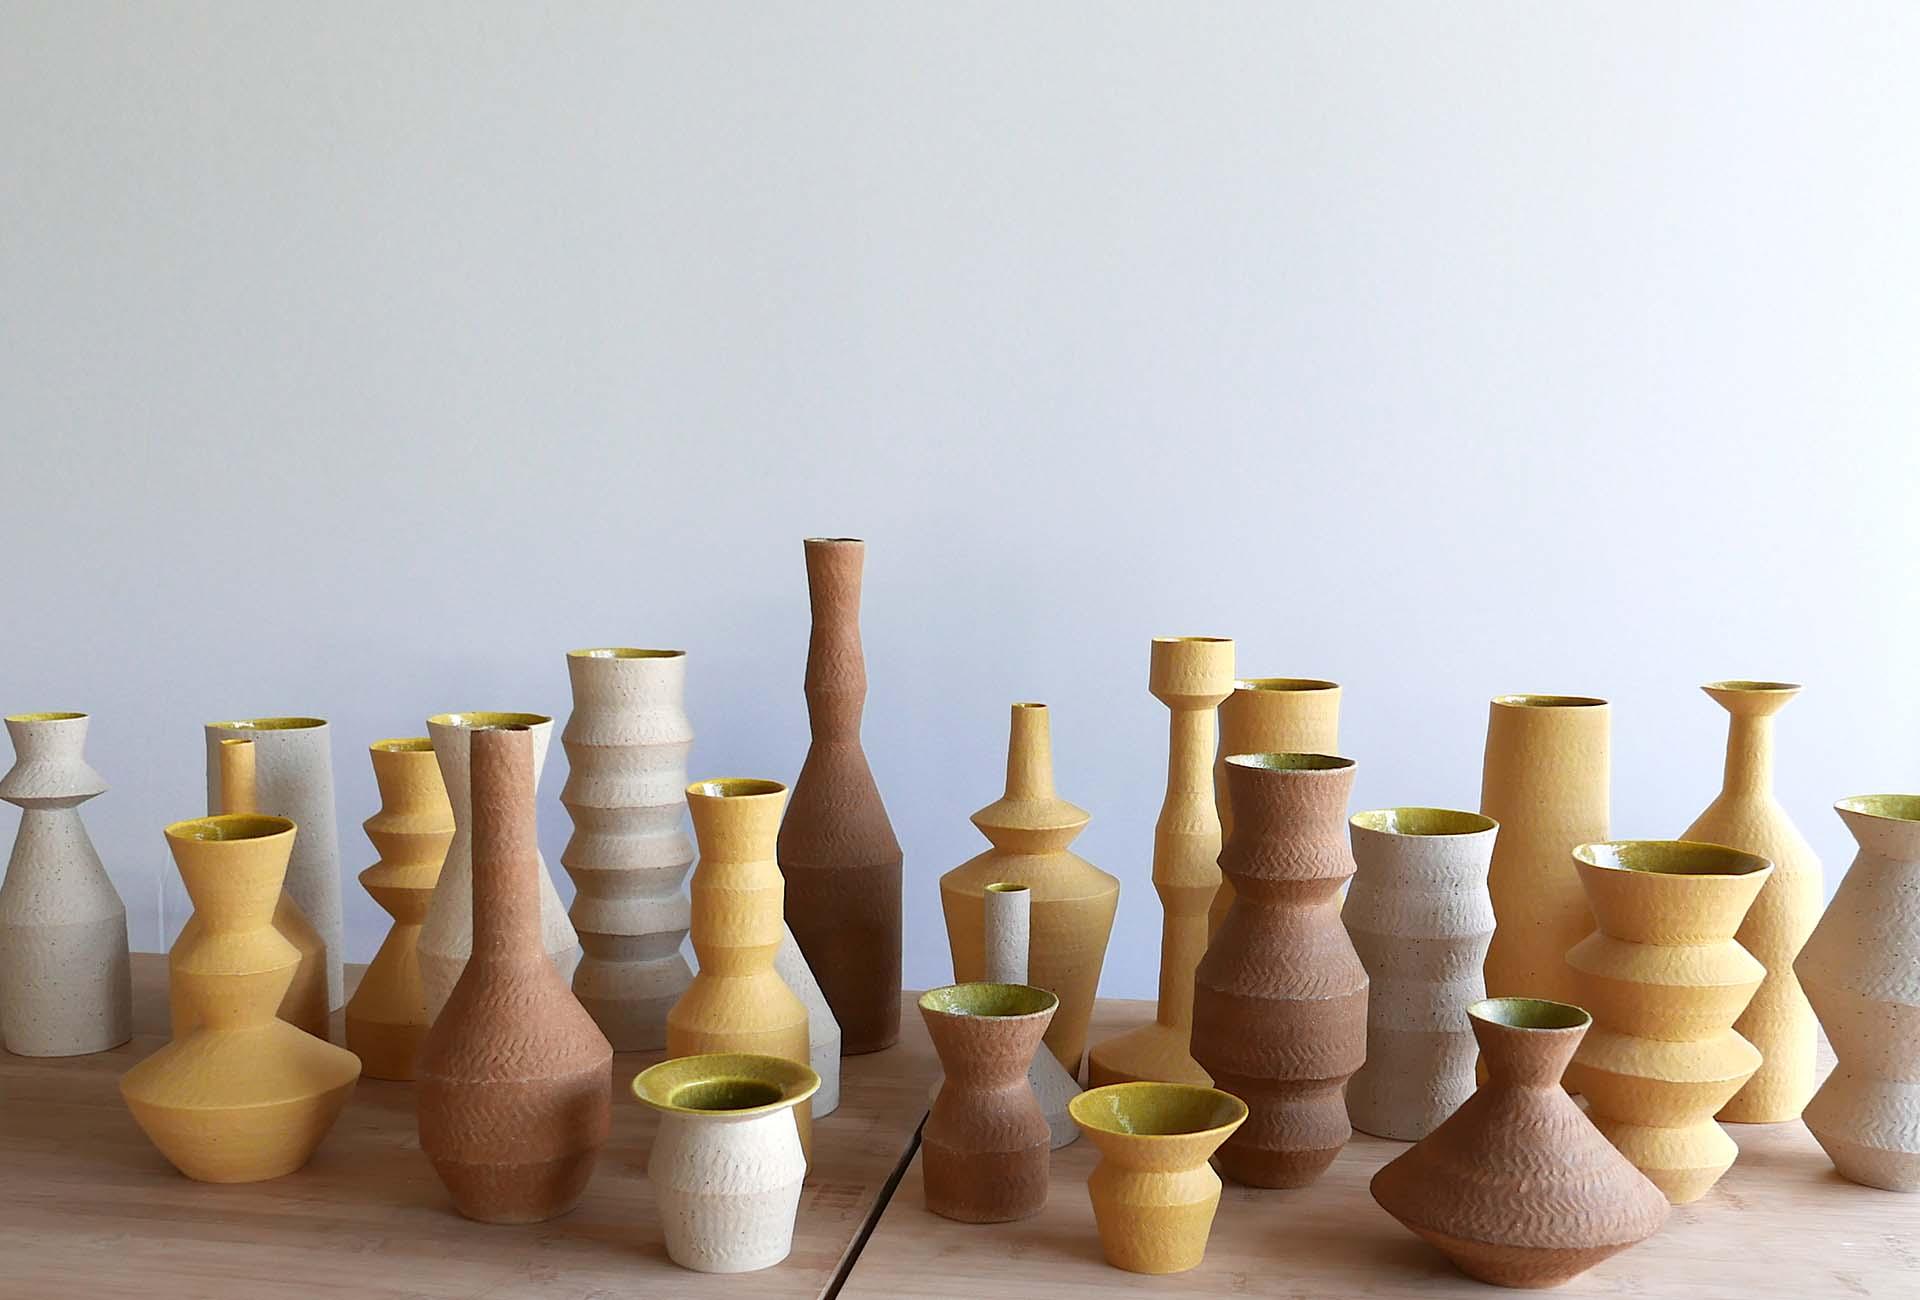 Südwestdeutscher Keramikpreis, Keramik, Kiho Kang